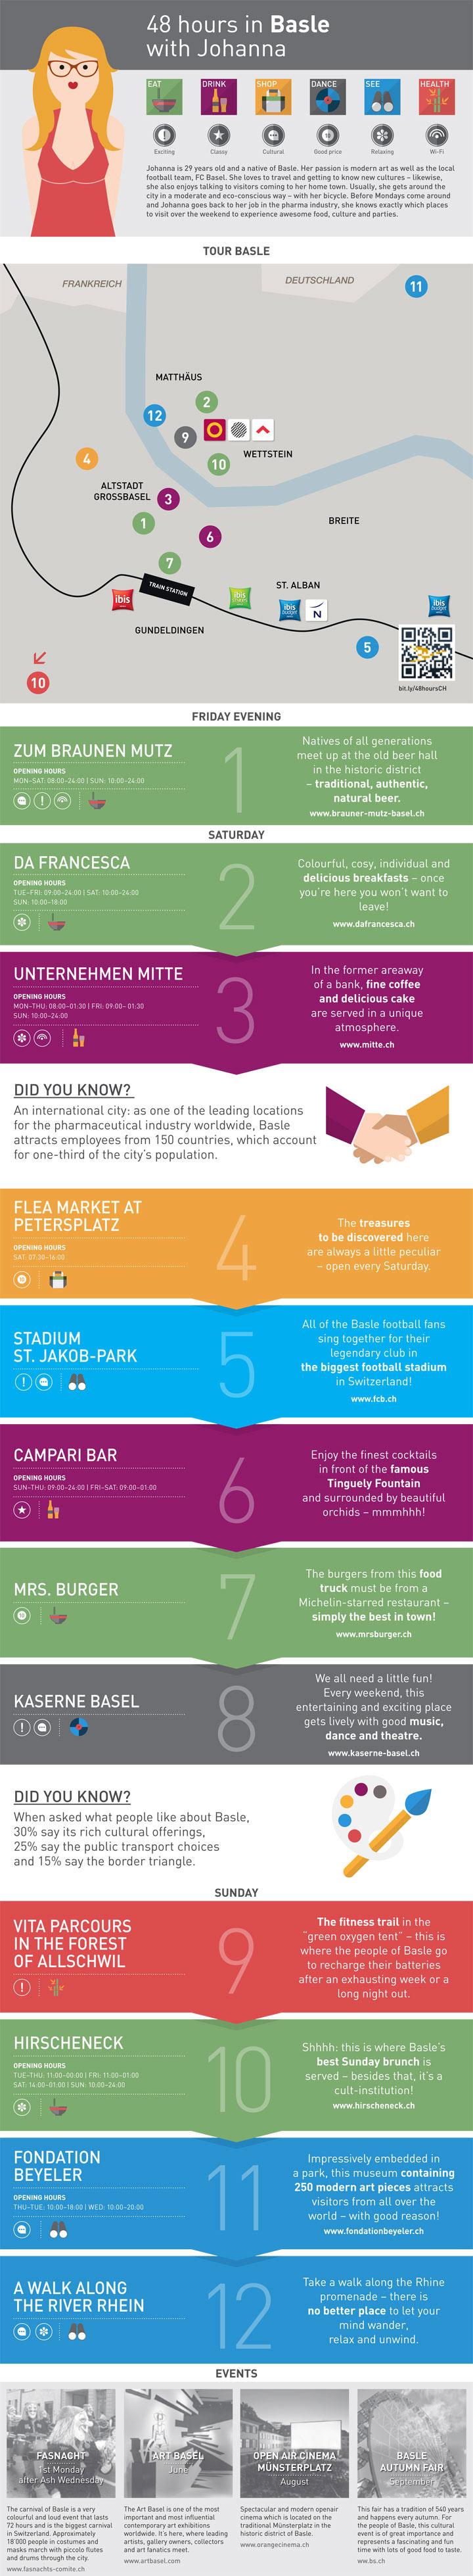 Basle Infographic